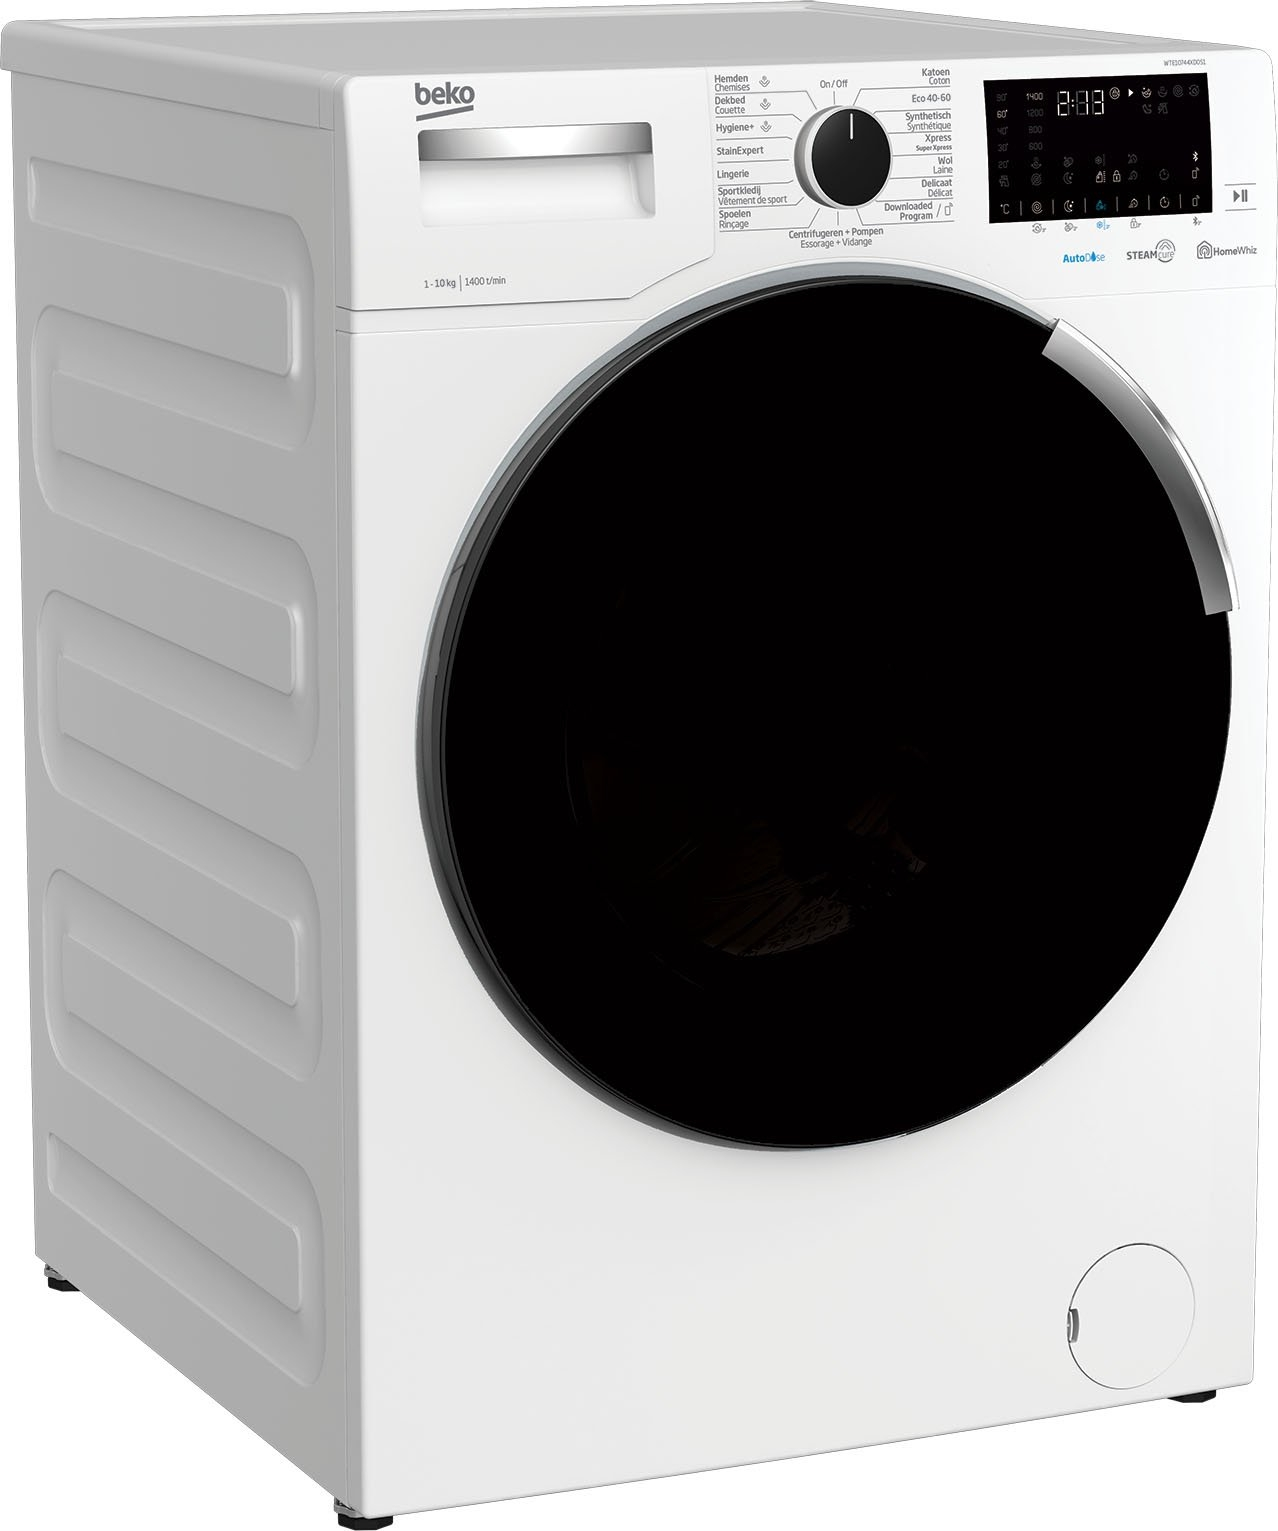 BEKO Wasmachine WTE10744XDOS1 nu online kopen bij OTTO